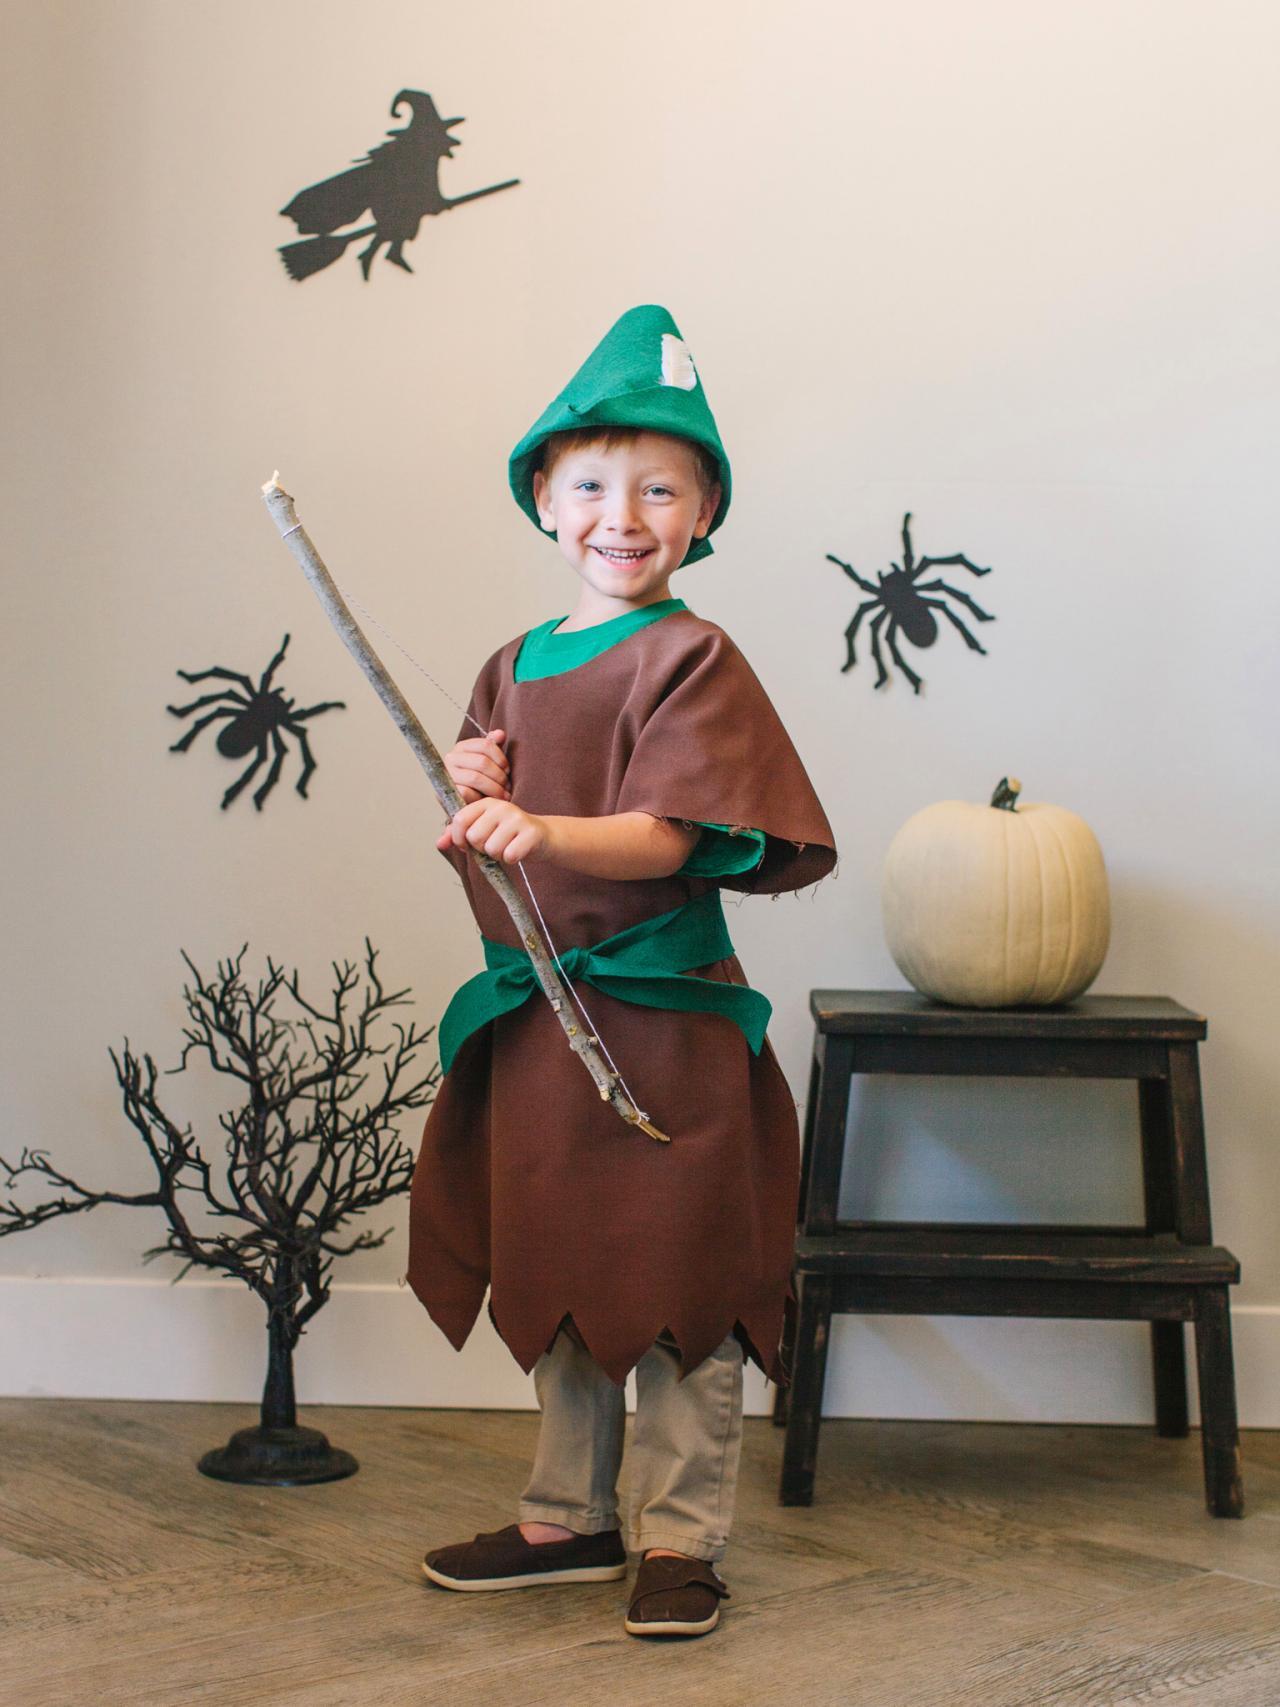 Diy kids robin hood halloween costume hgtv make a robin hood kids costume for halloween solutioingenieria Gallery